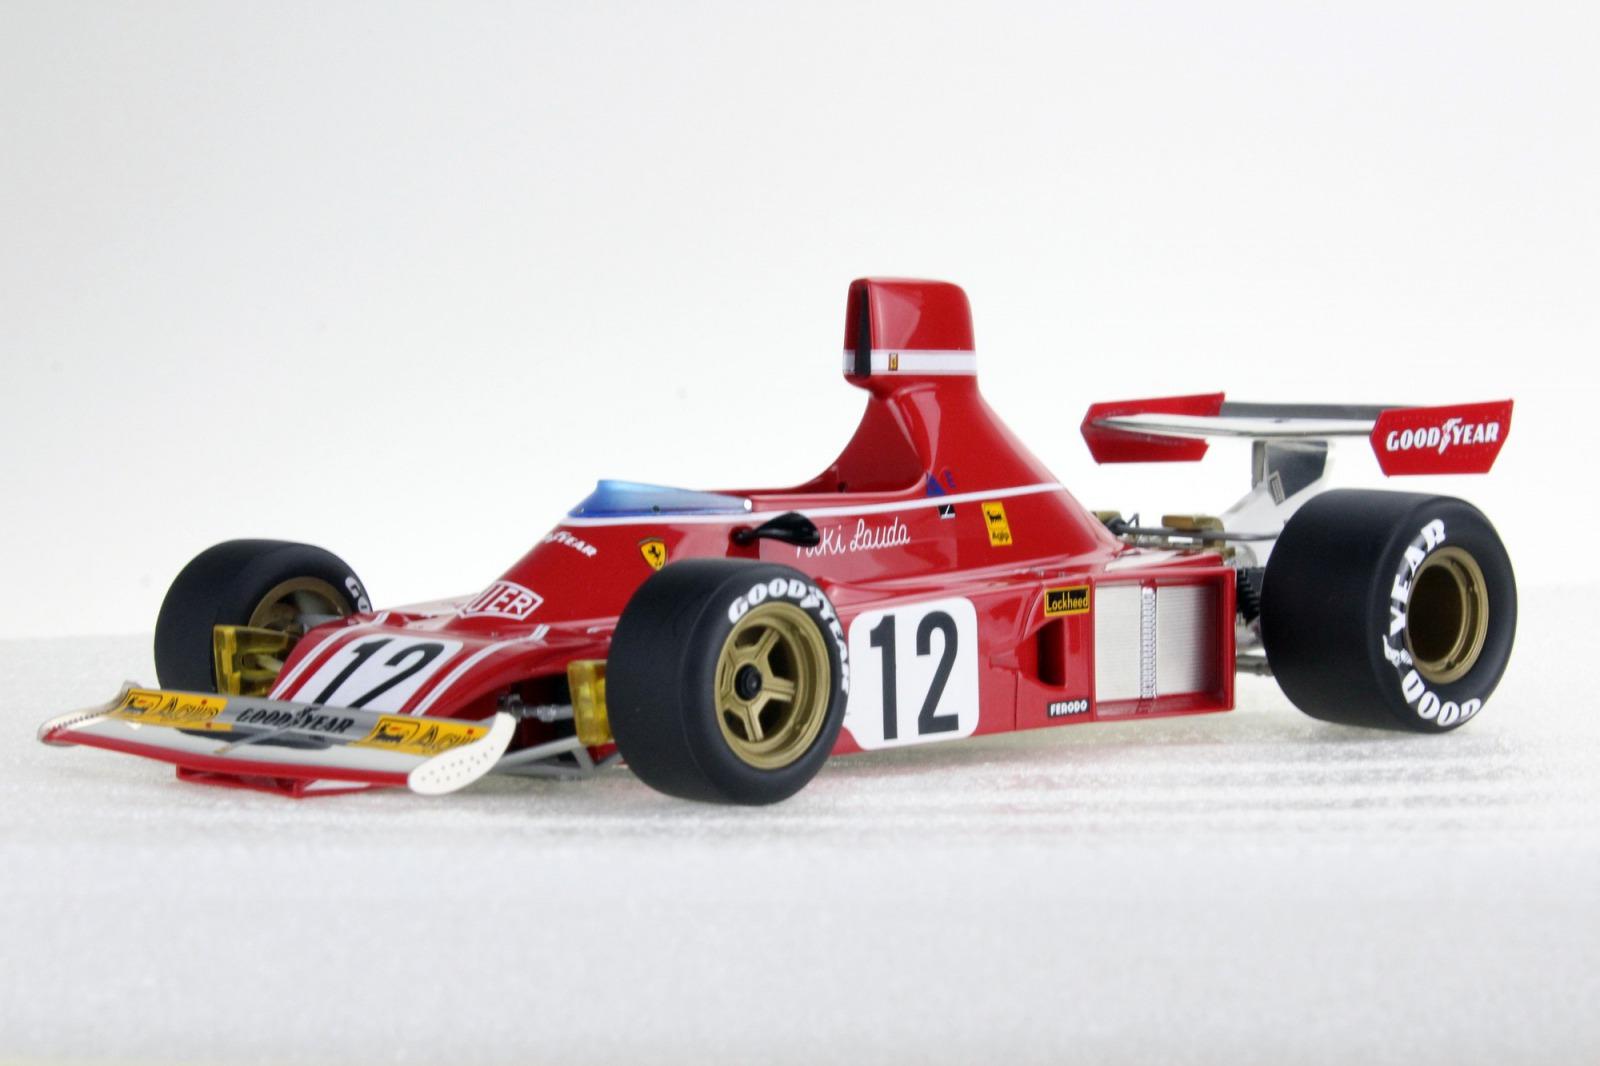 GP Replicas 1/18 ミニカー レジン プロポーションモデル 1975年シーズン フェラーリ F1 312 B3 No.12 N.LaudaFERRARI - F1 312 B3 N 12 NIKI LAUDA SEASON 1974 (AND FIRST TWO RACE 1975 WORLD CHAMPION 1975) 1:18 GP Replicas